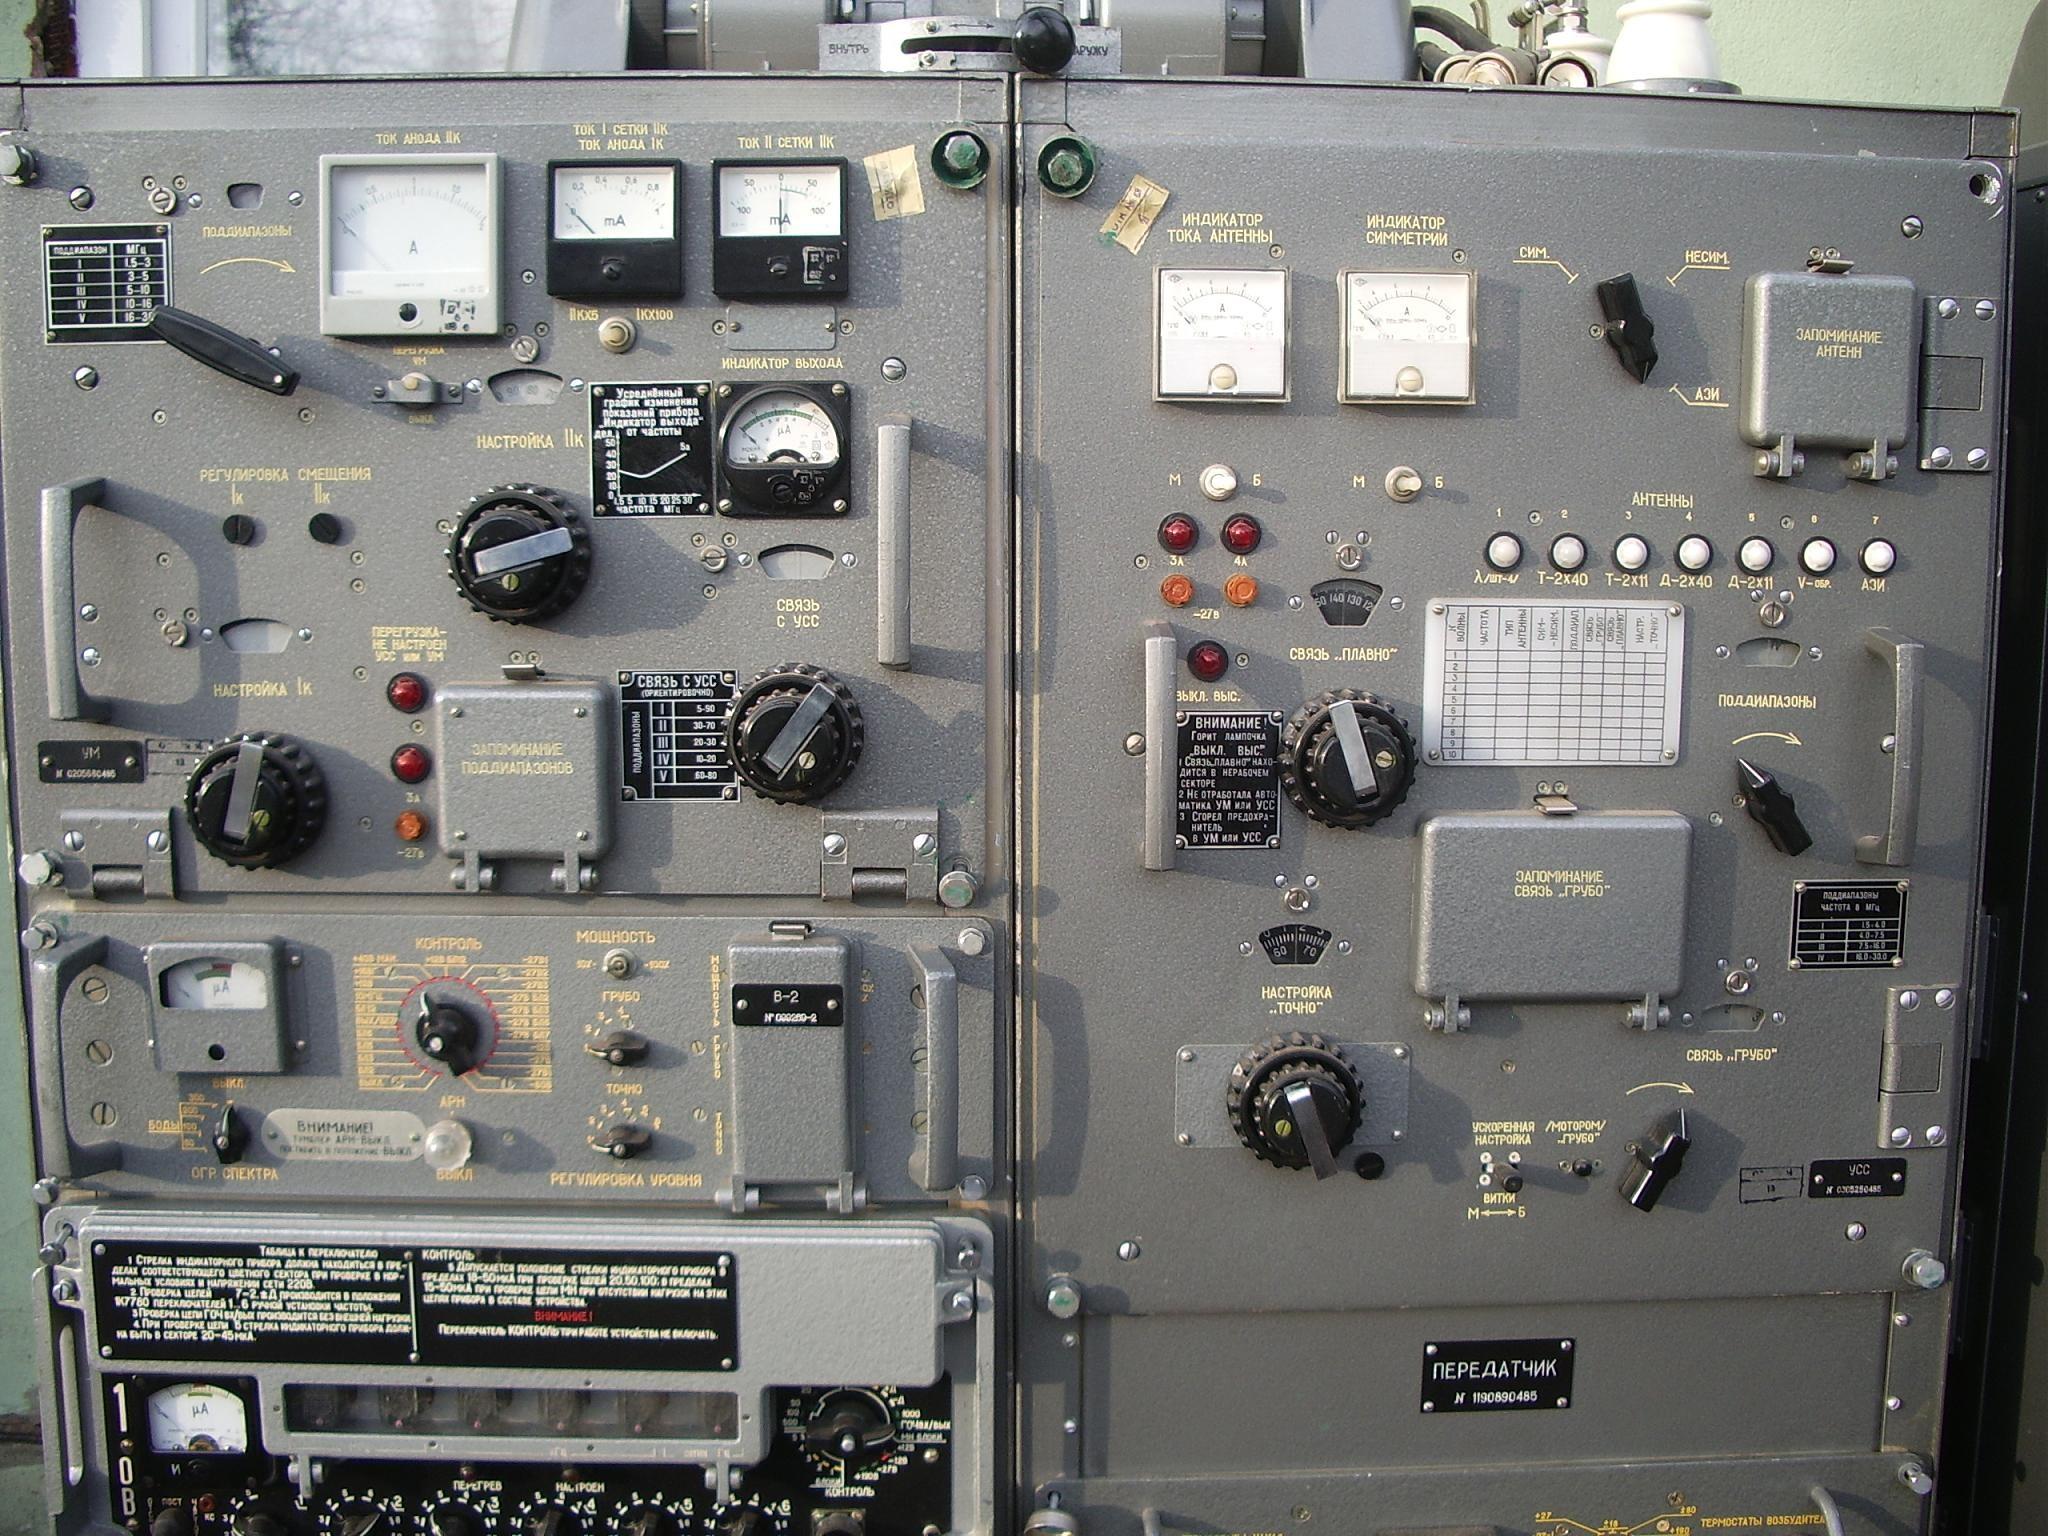 Внешний вид радиостанции Р-140